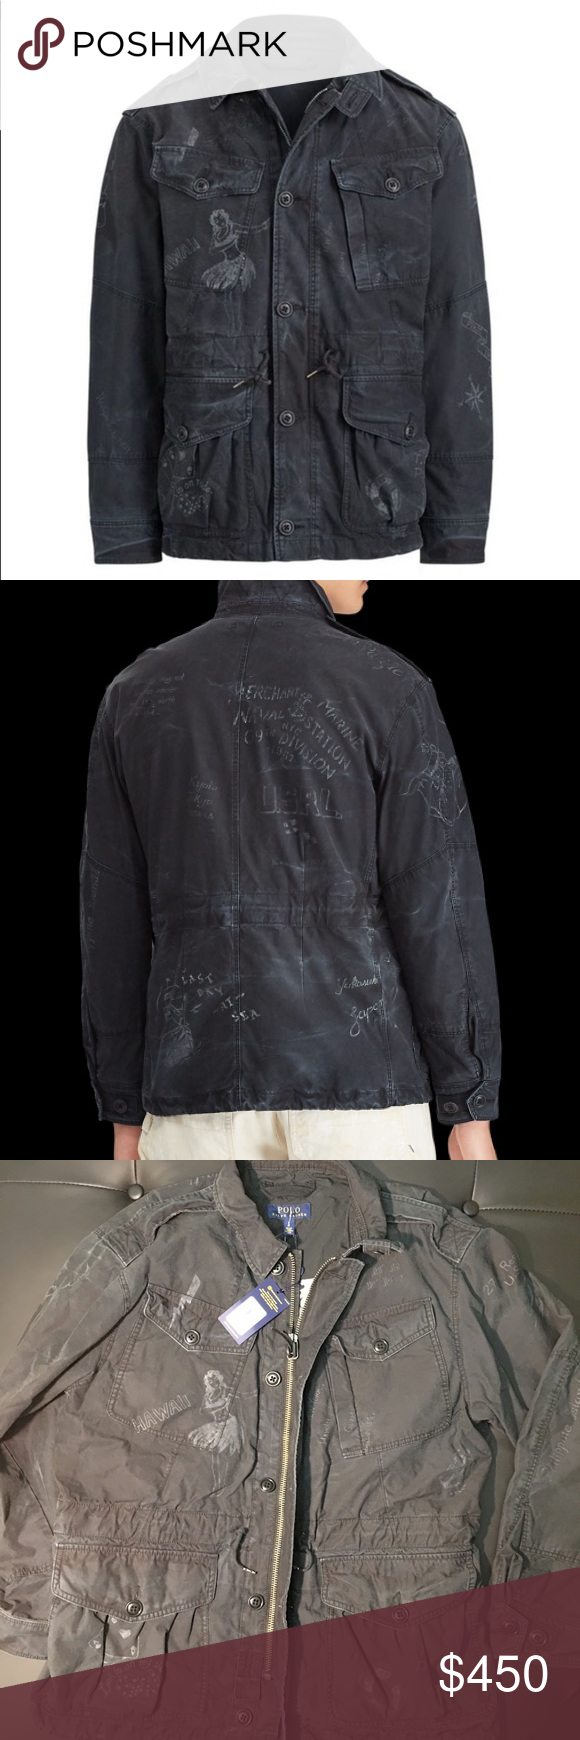 Polo Ralph Lauren Print cotton utility jacket Polo ralph